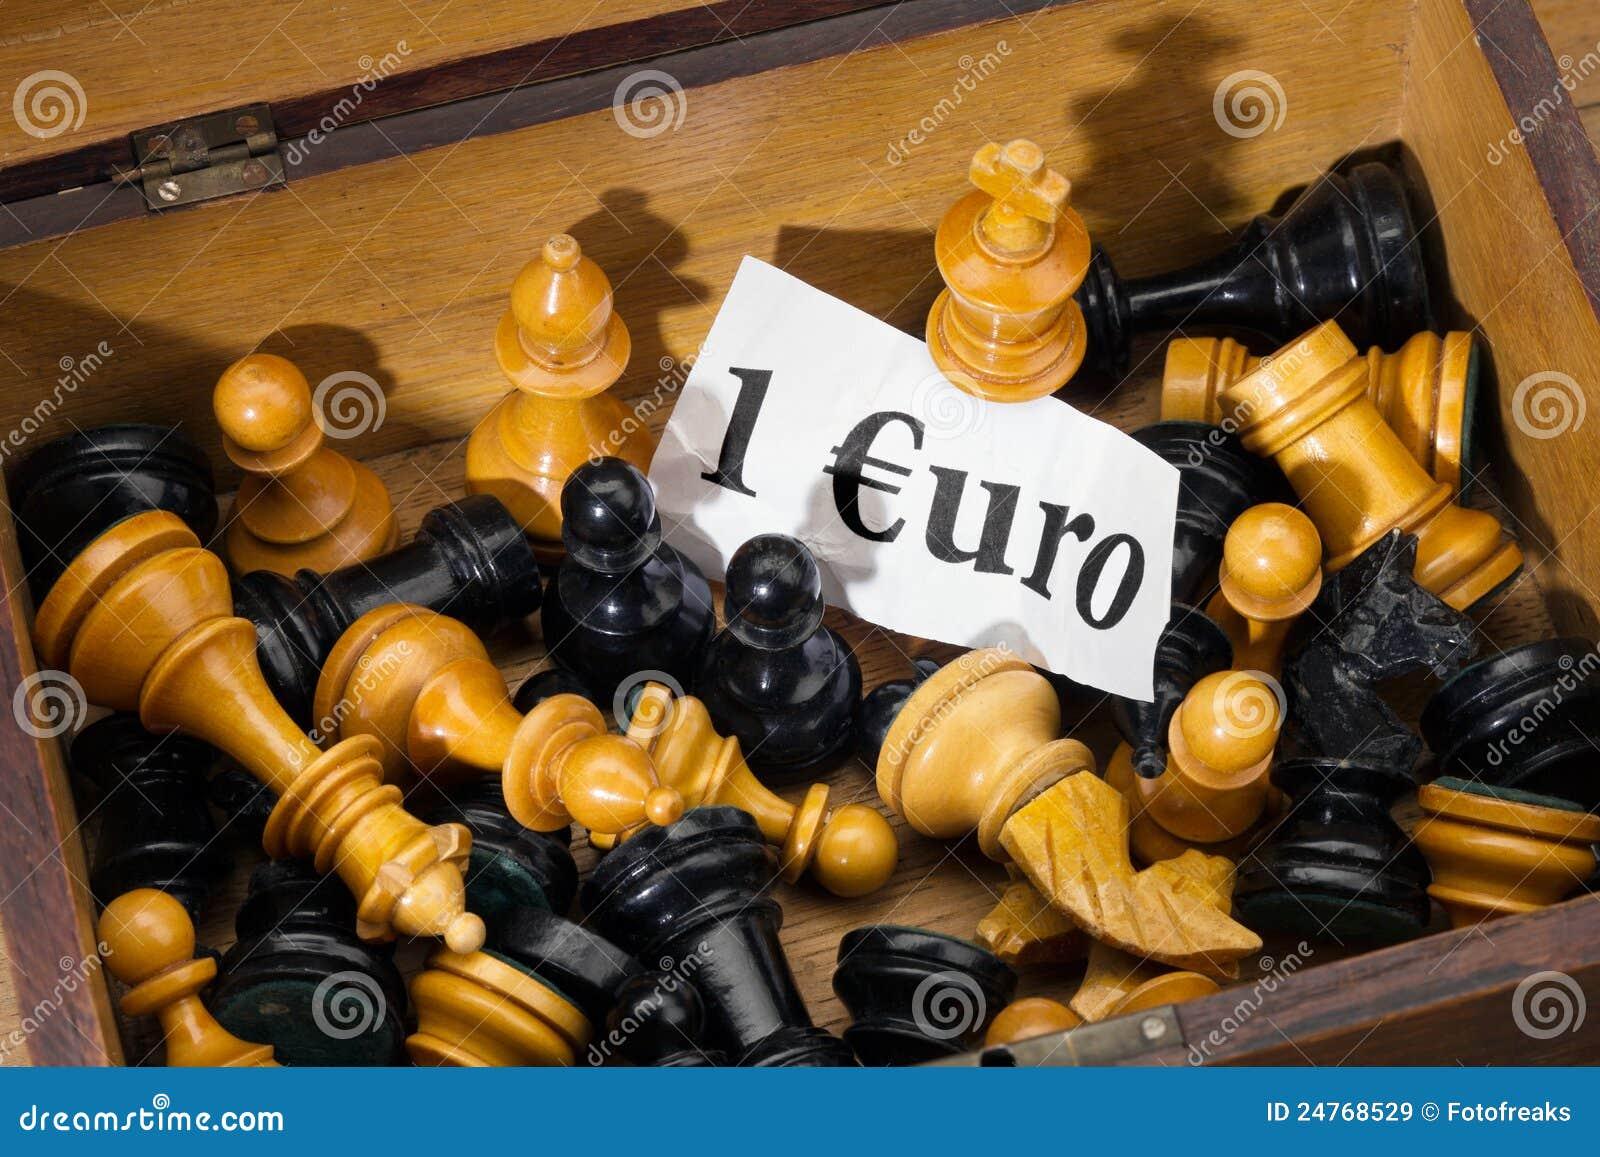 Ajedrez y euro